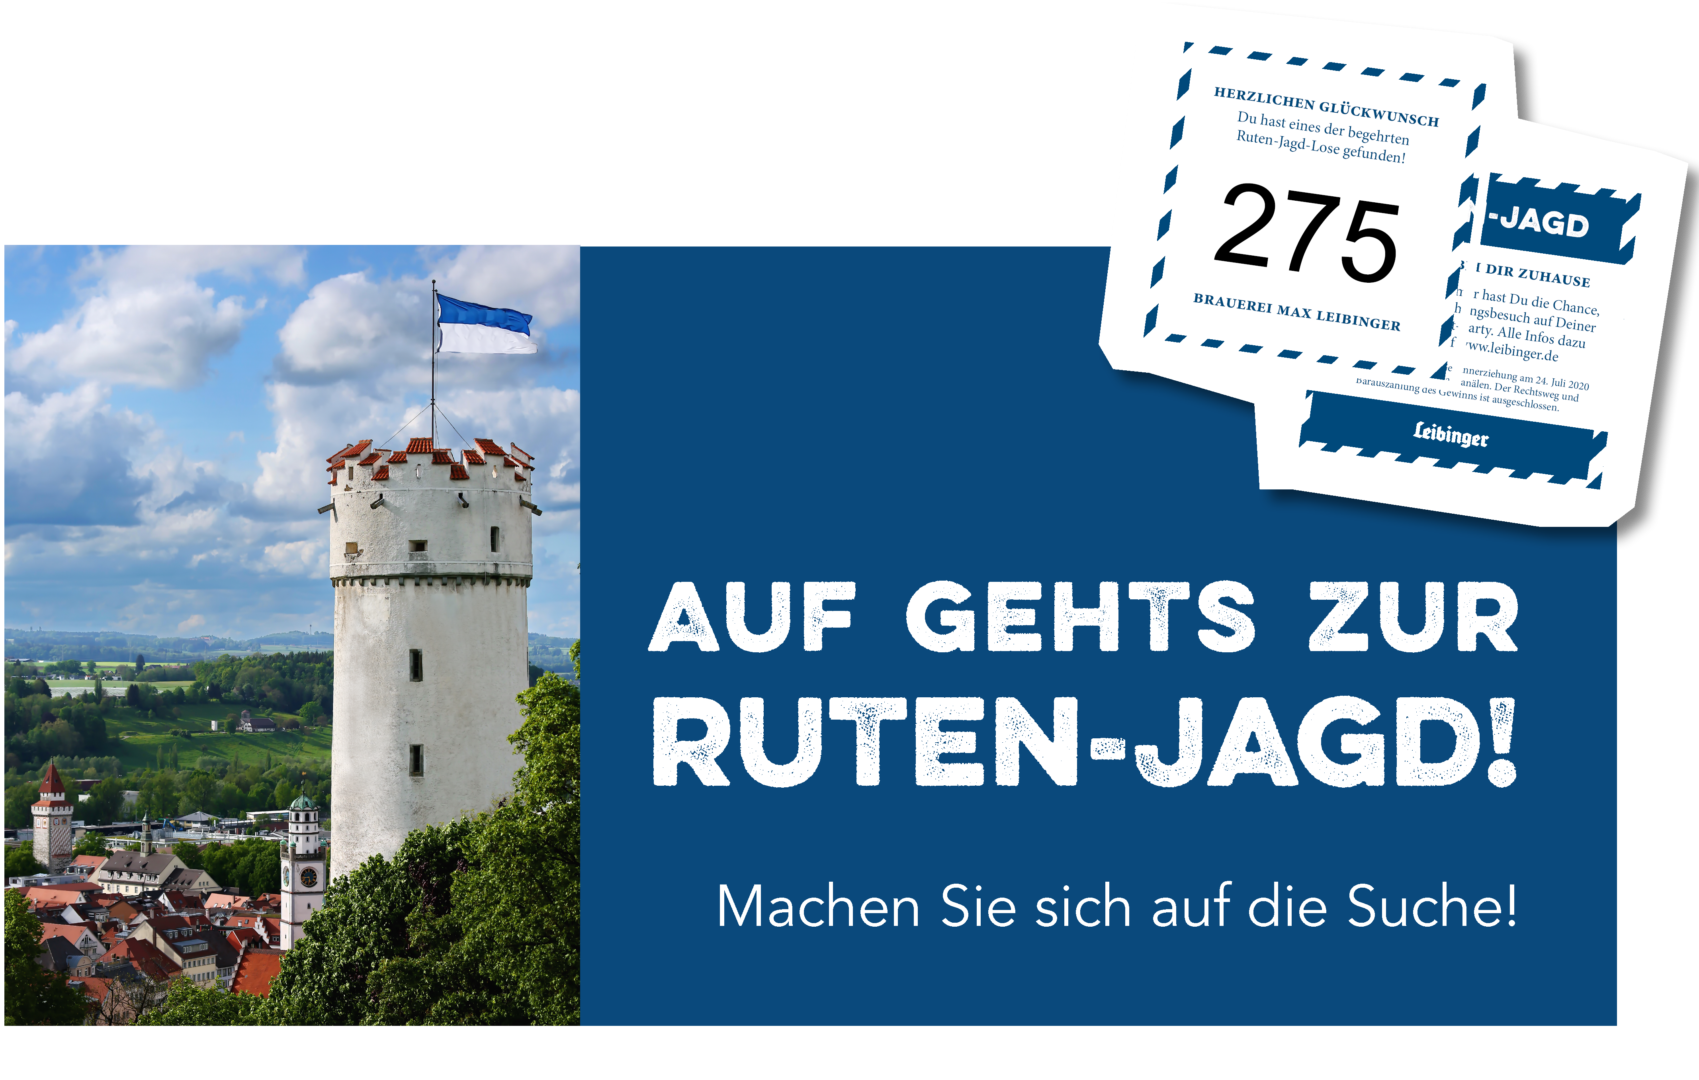 Ruten-Jagd Rutenfest Ravensburg